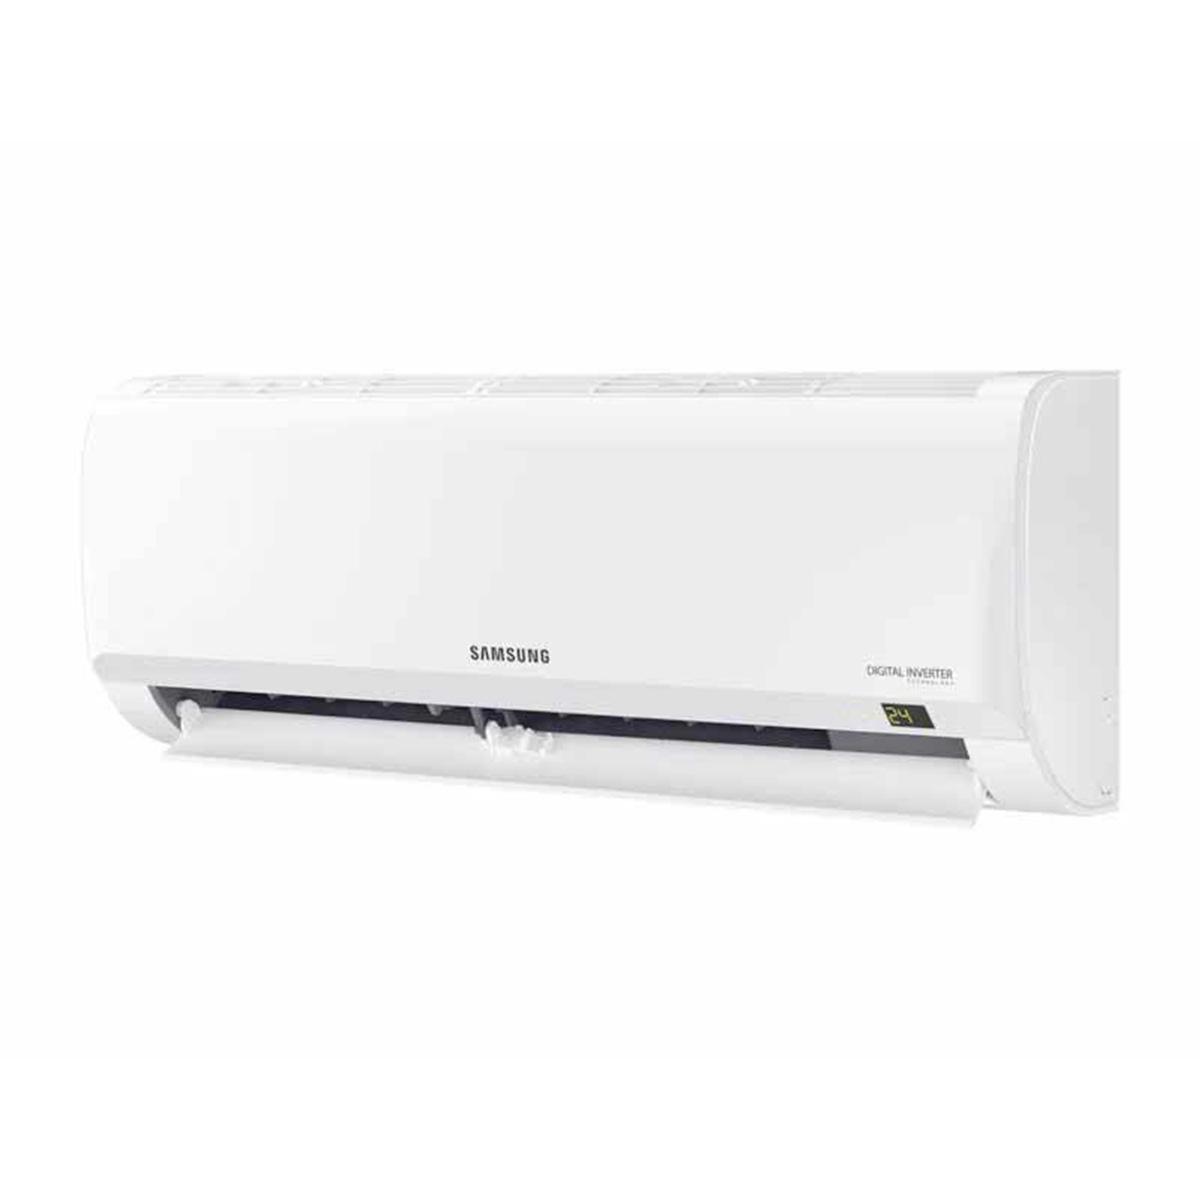 Aparat de aer conditionat tip split Samsung Galaxy Air, Racire Rapida, Filtru Hd, Clasa A++, R32 26